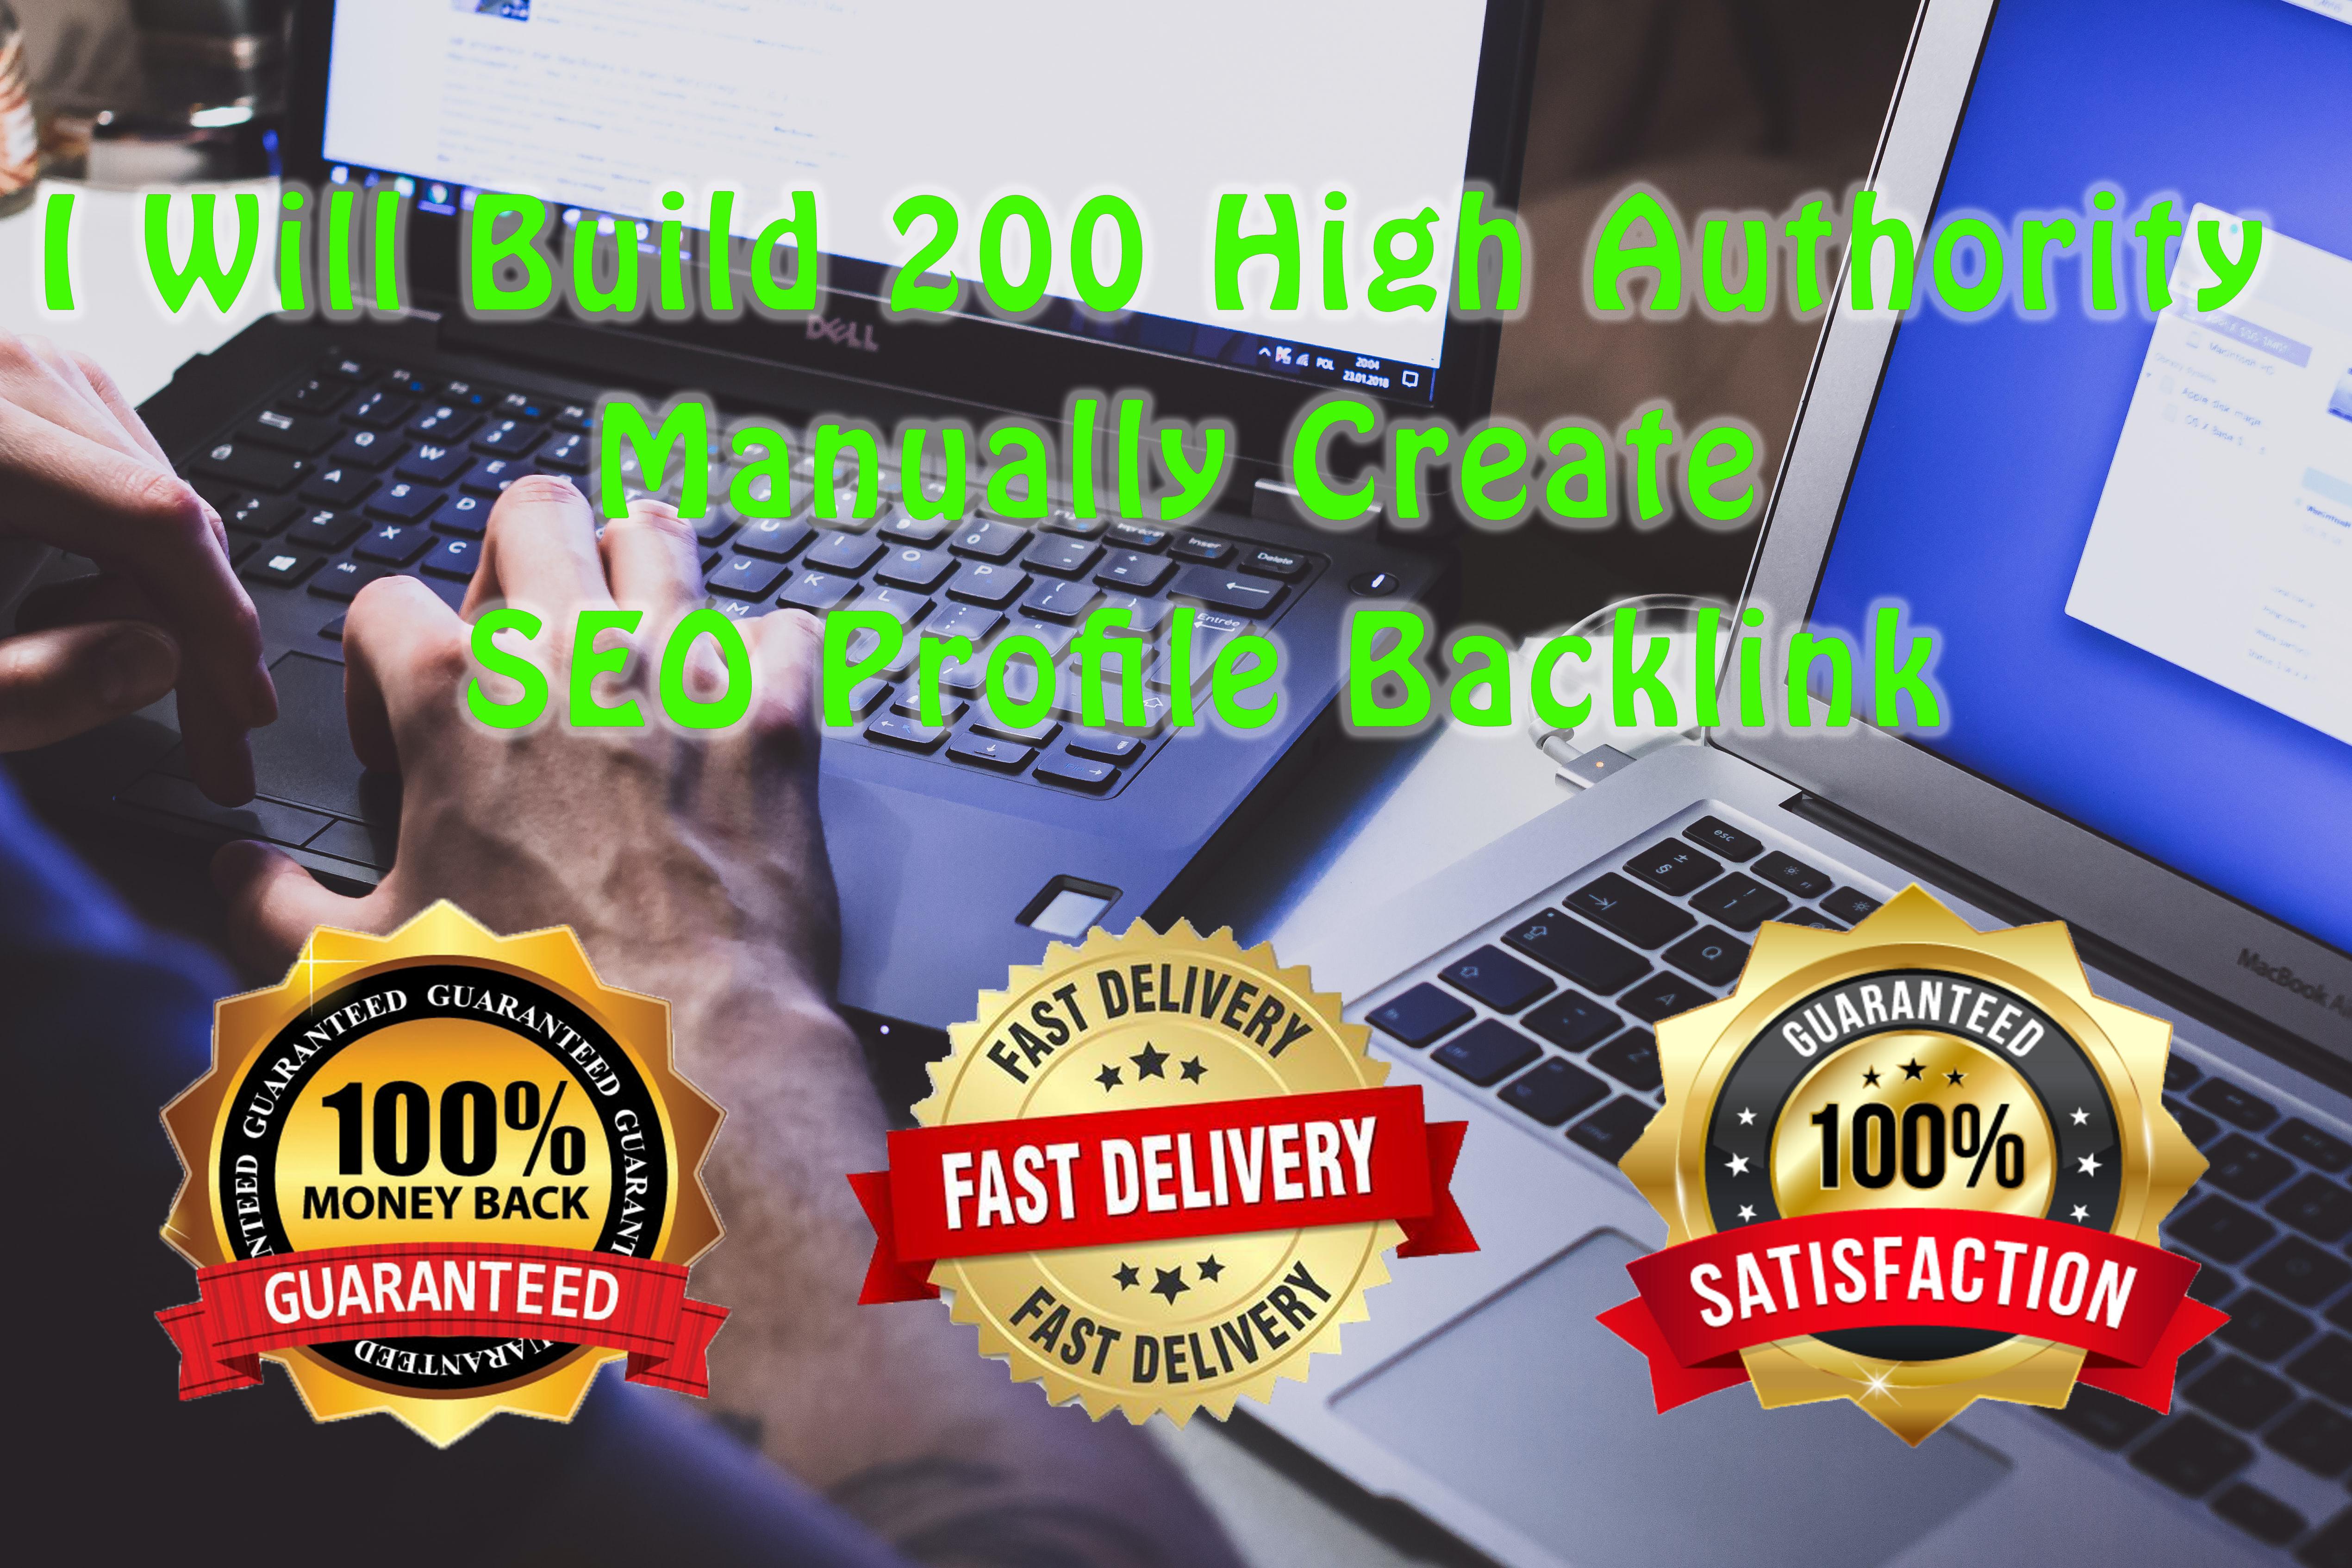 I Will Build 200 High Authority Manually Create SEO Profile Backlink